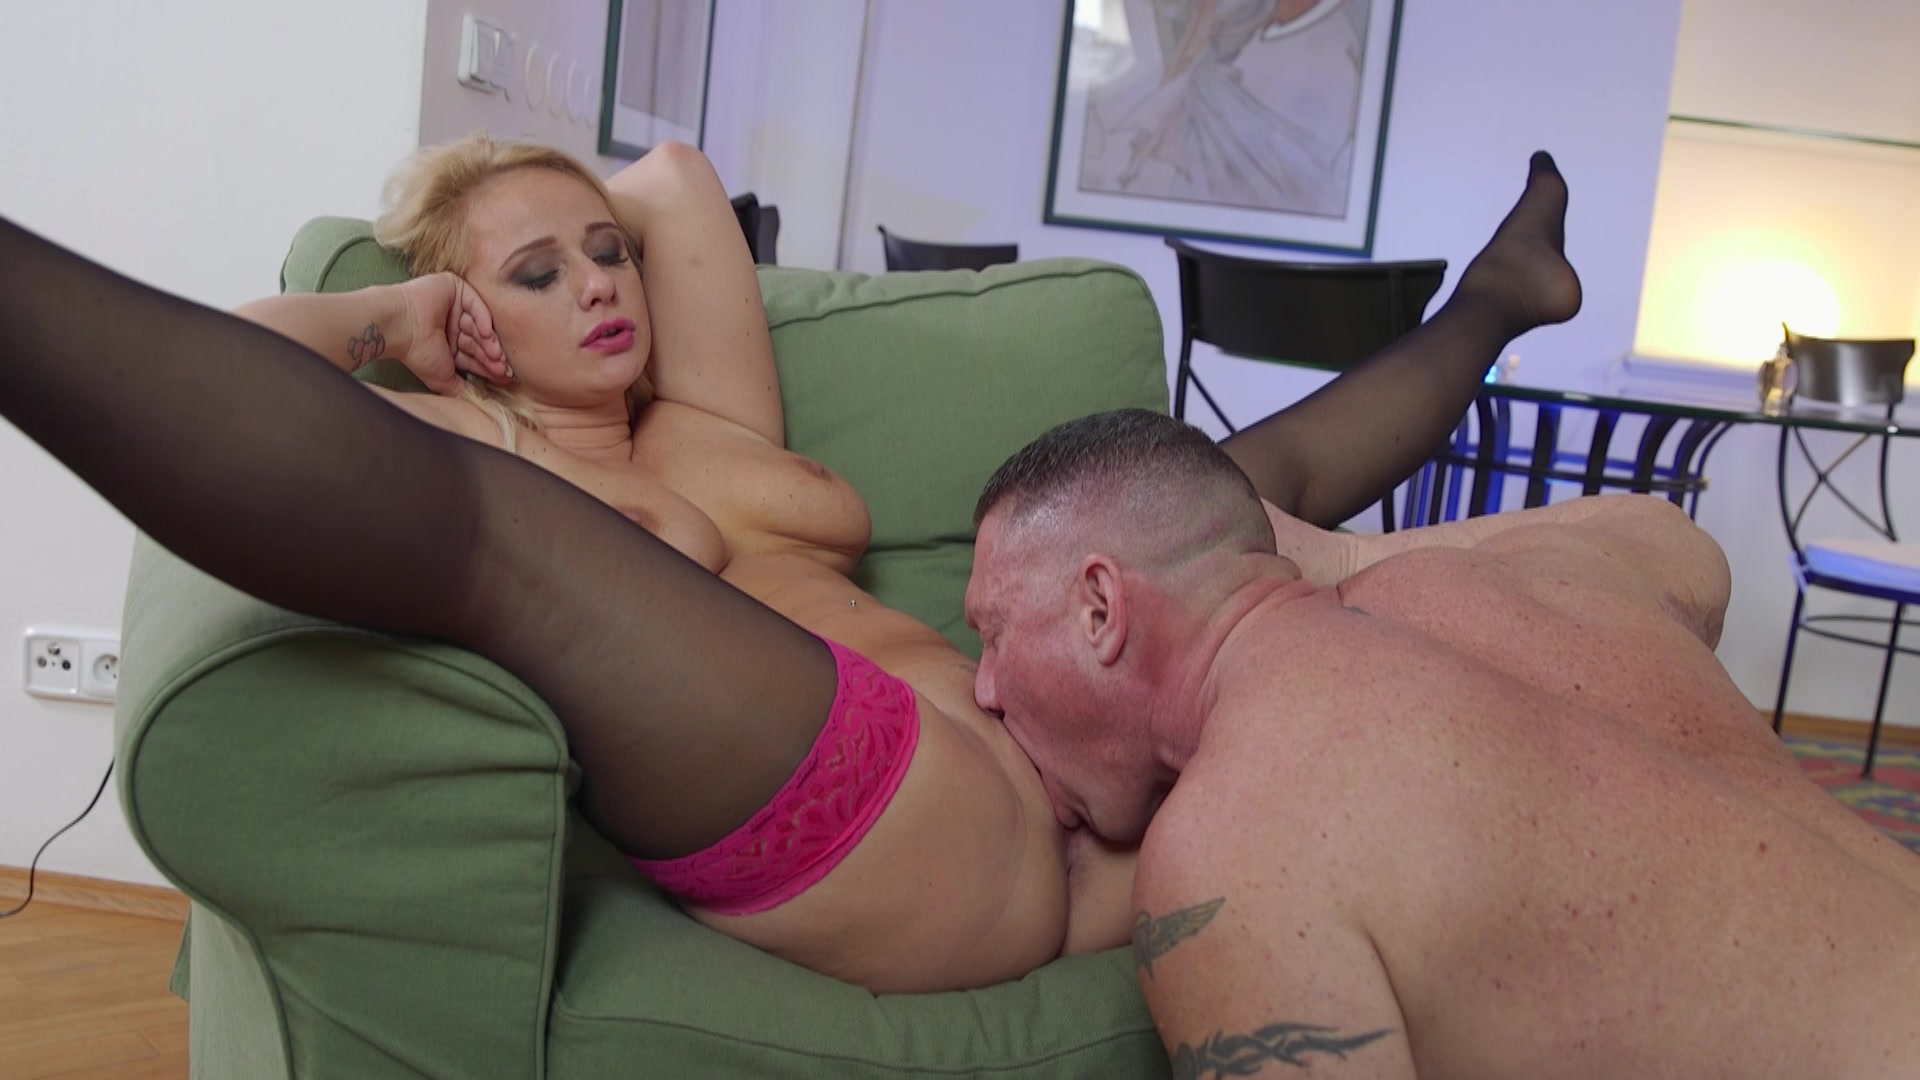 Aphrodisiac Porn aphrodisiac